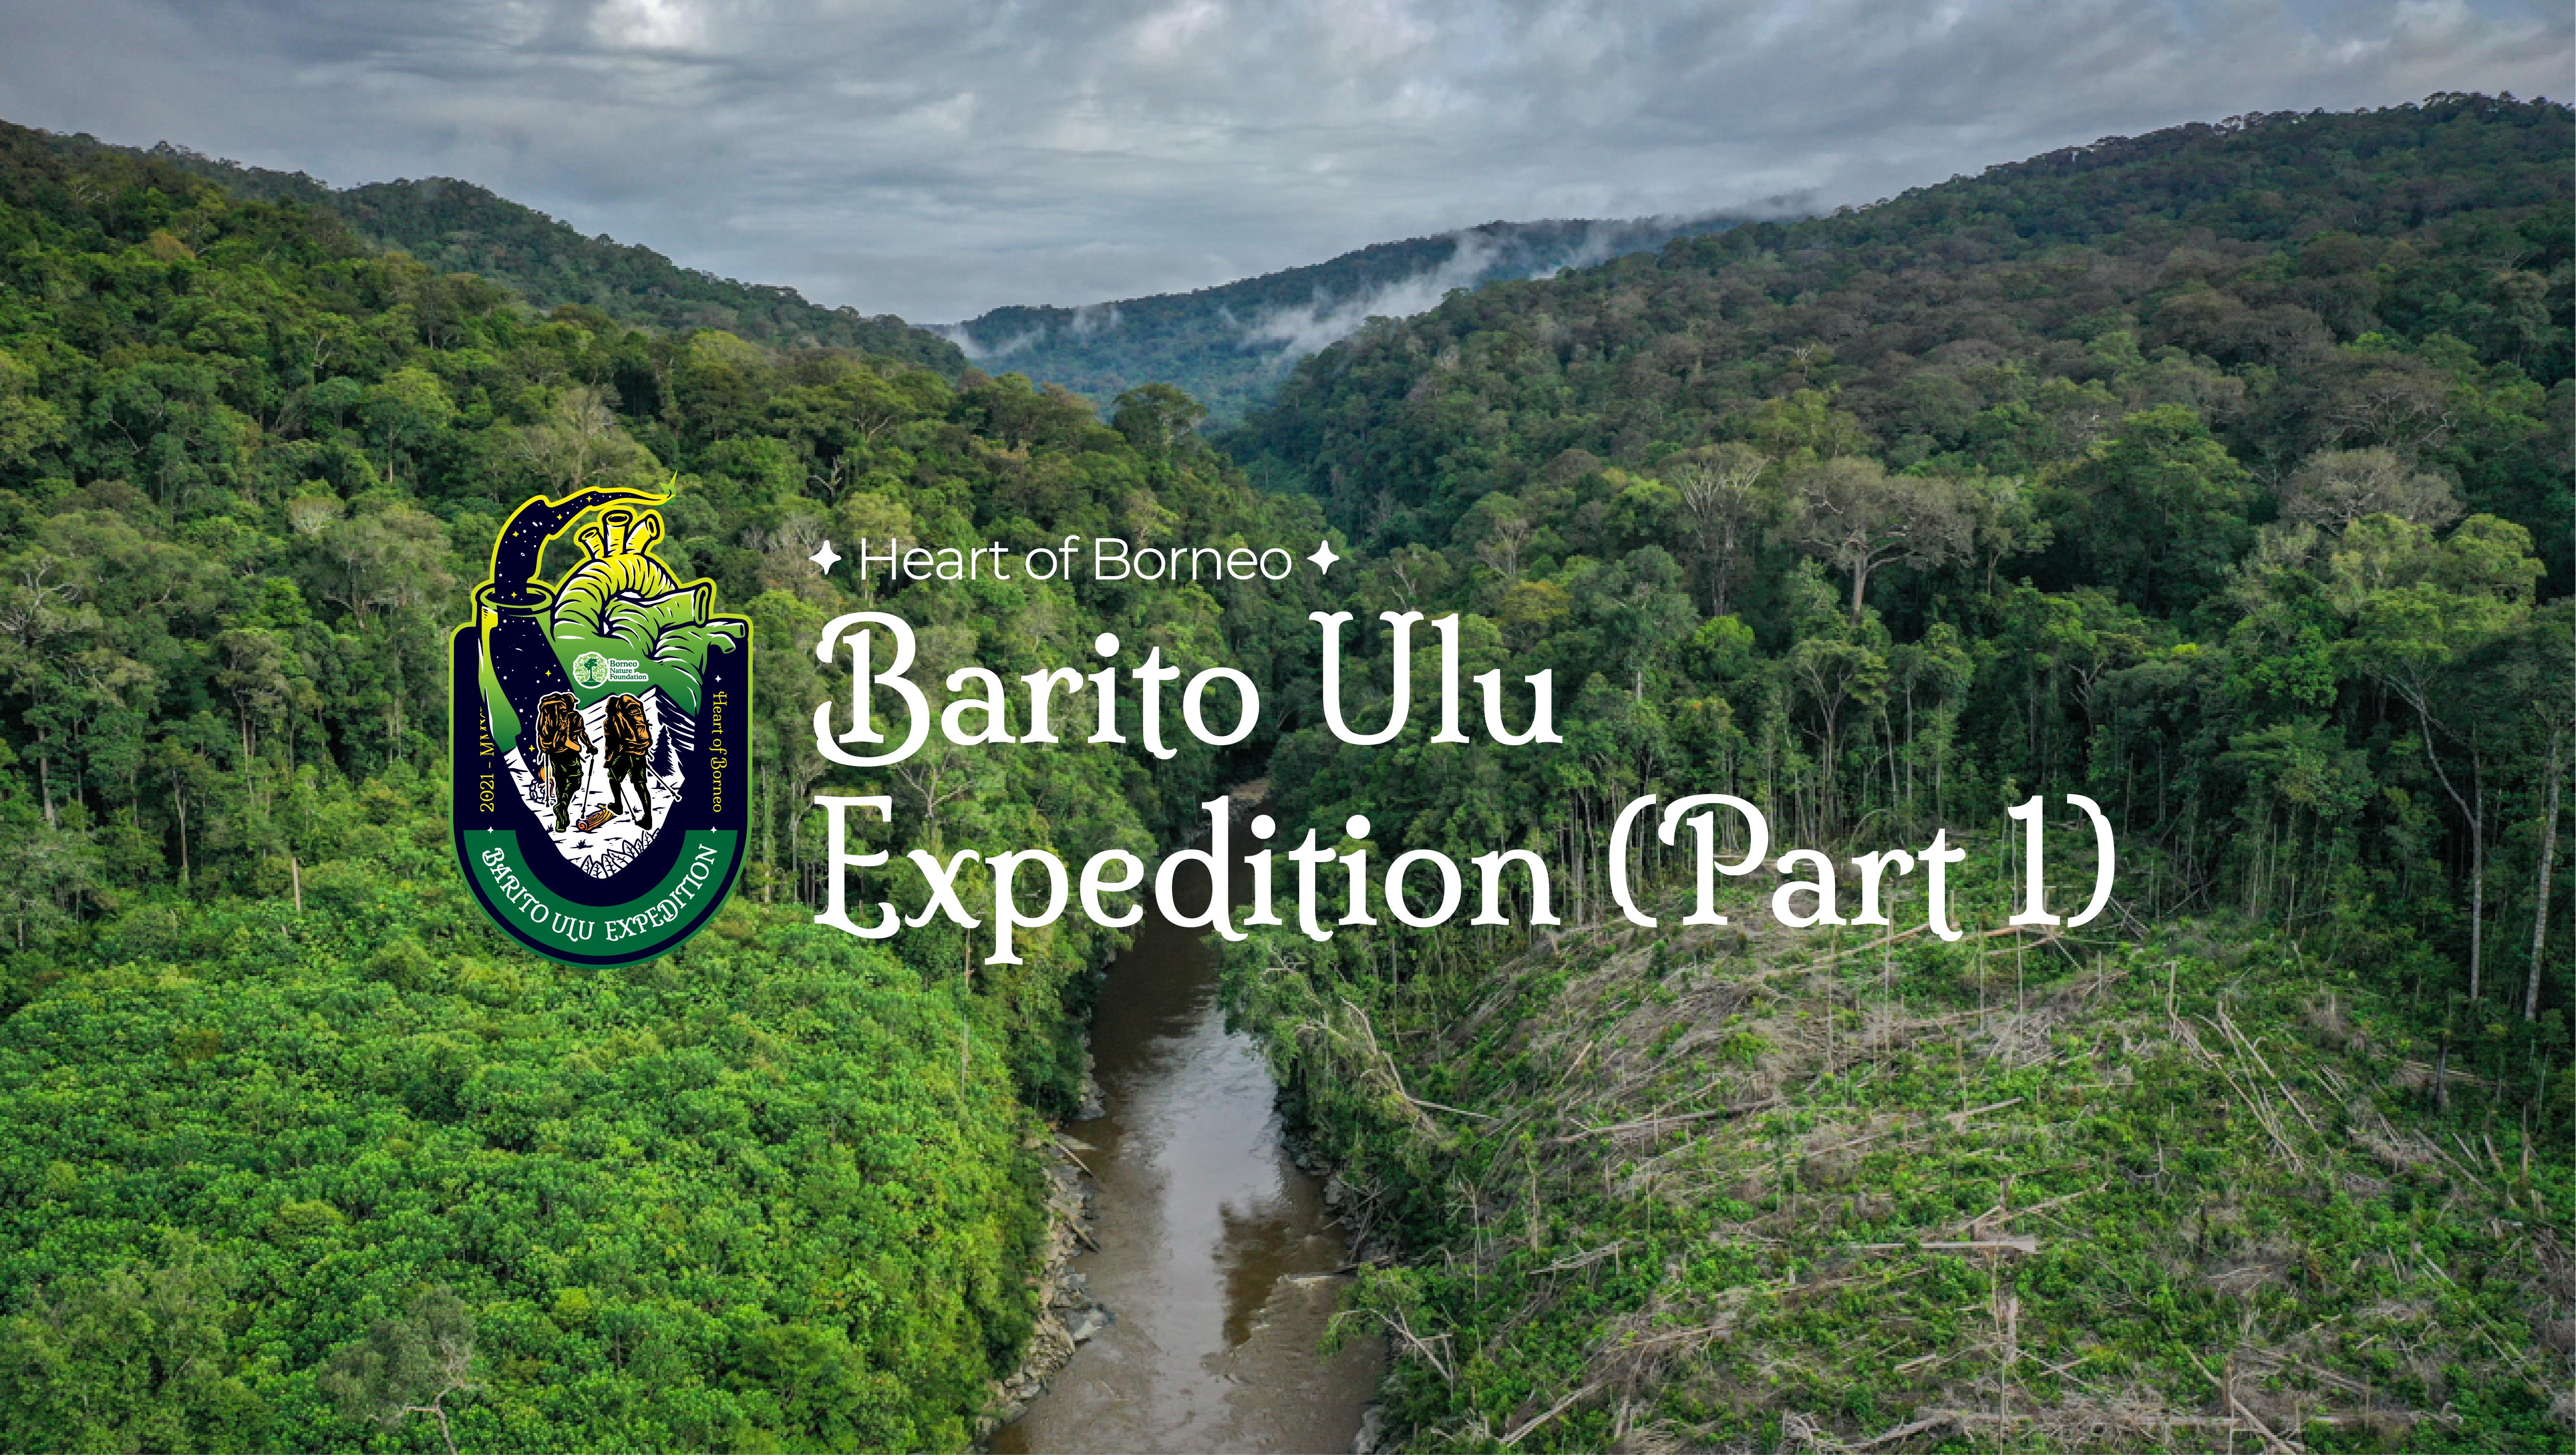 210707 - Barito Ulu Expedition - web banner-01 (1)